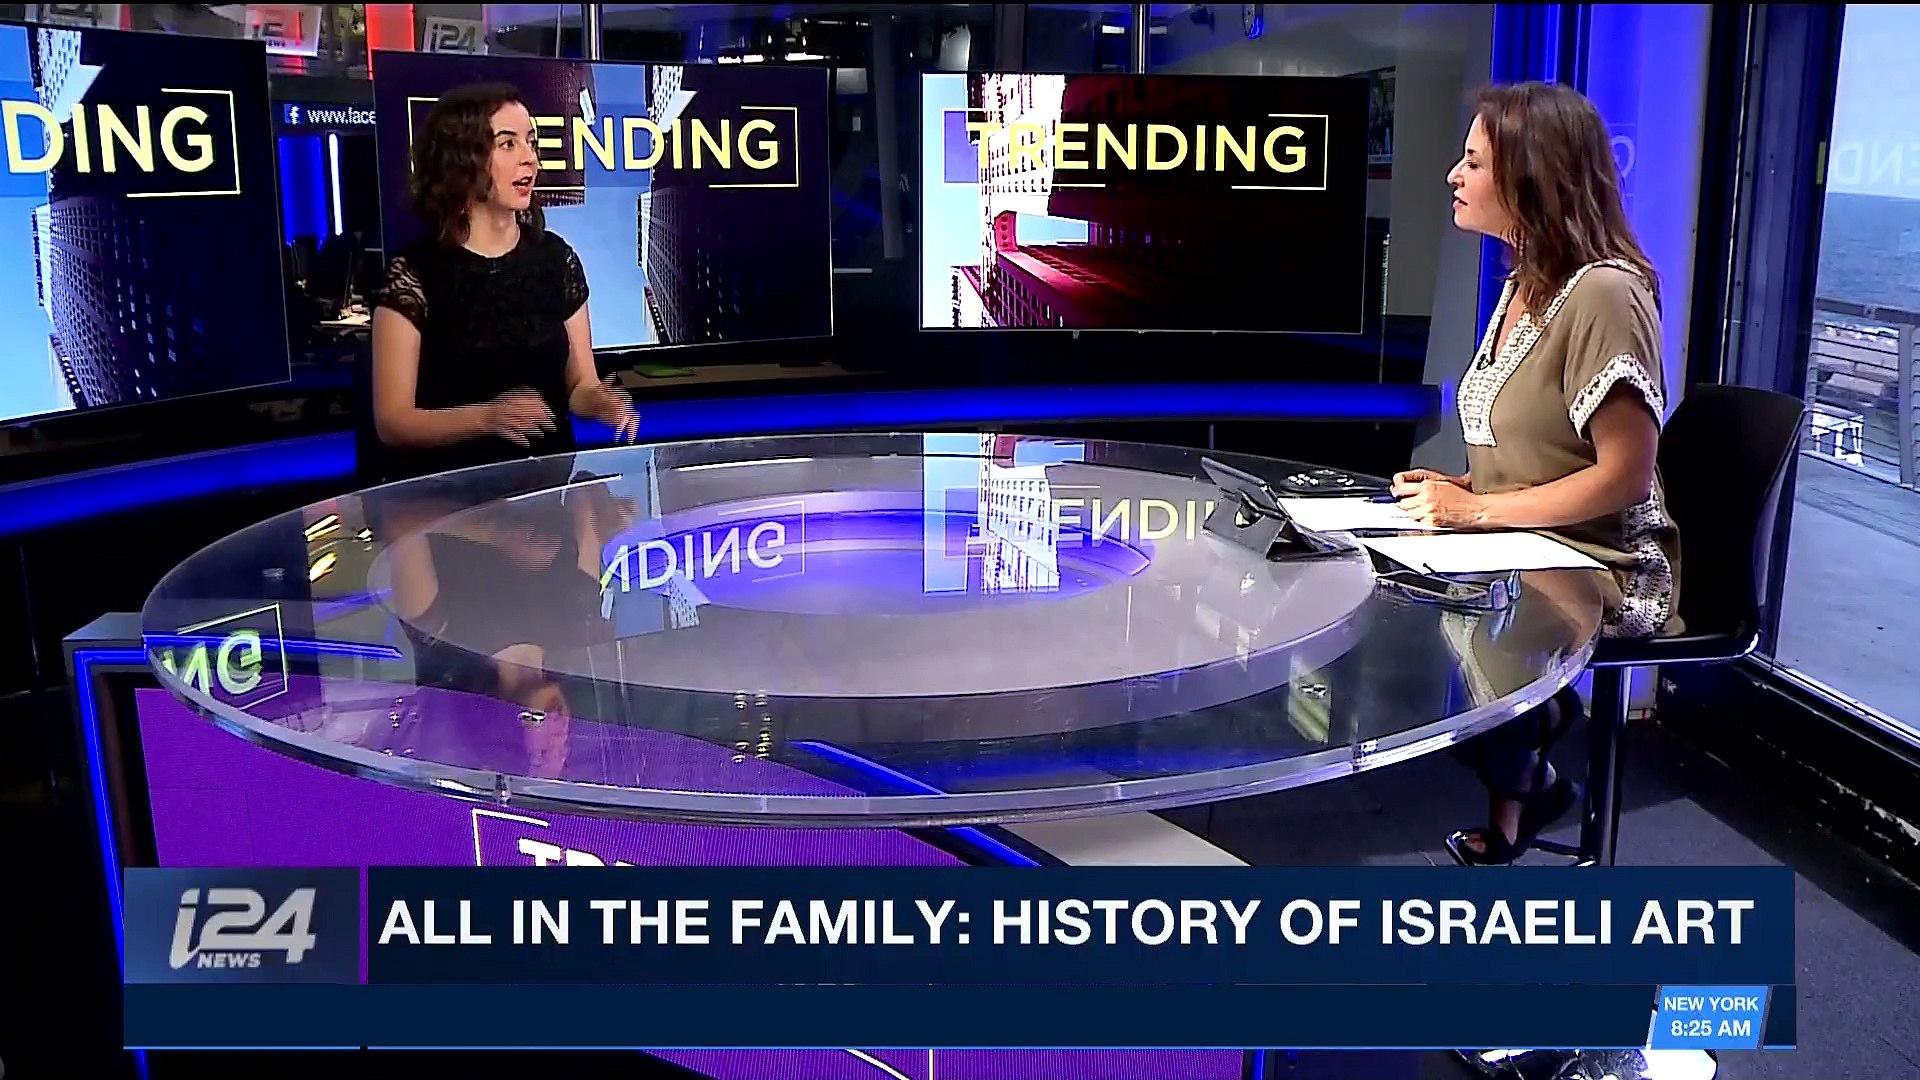 TRENDING | All In The Family: history of Israeli art | Friday, April 27th 2018